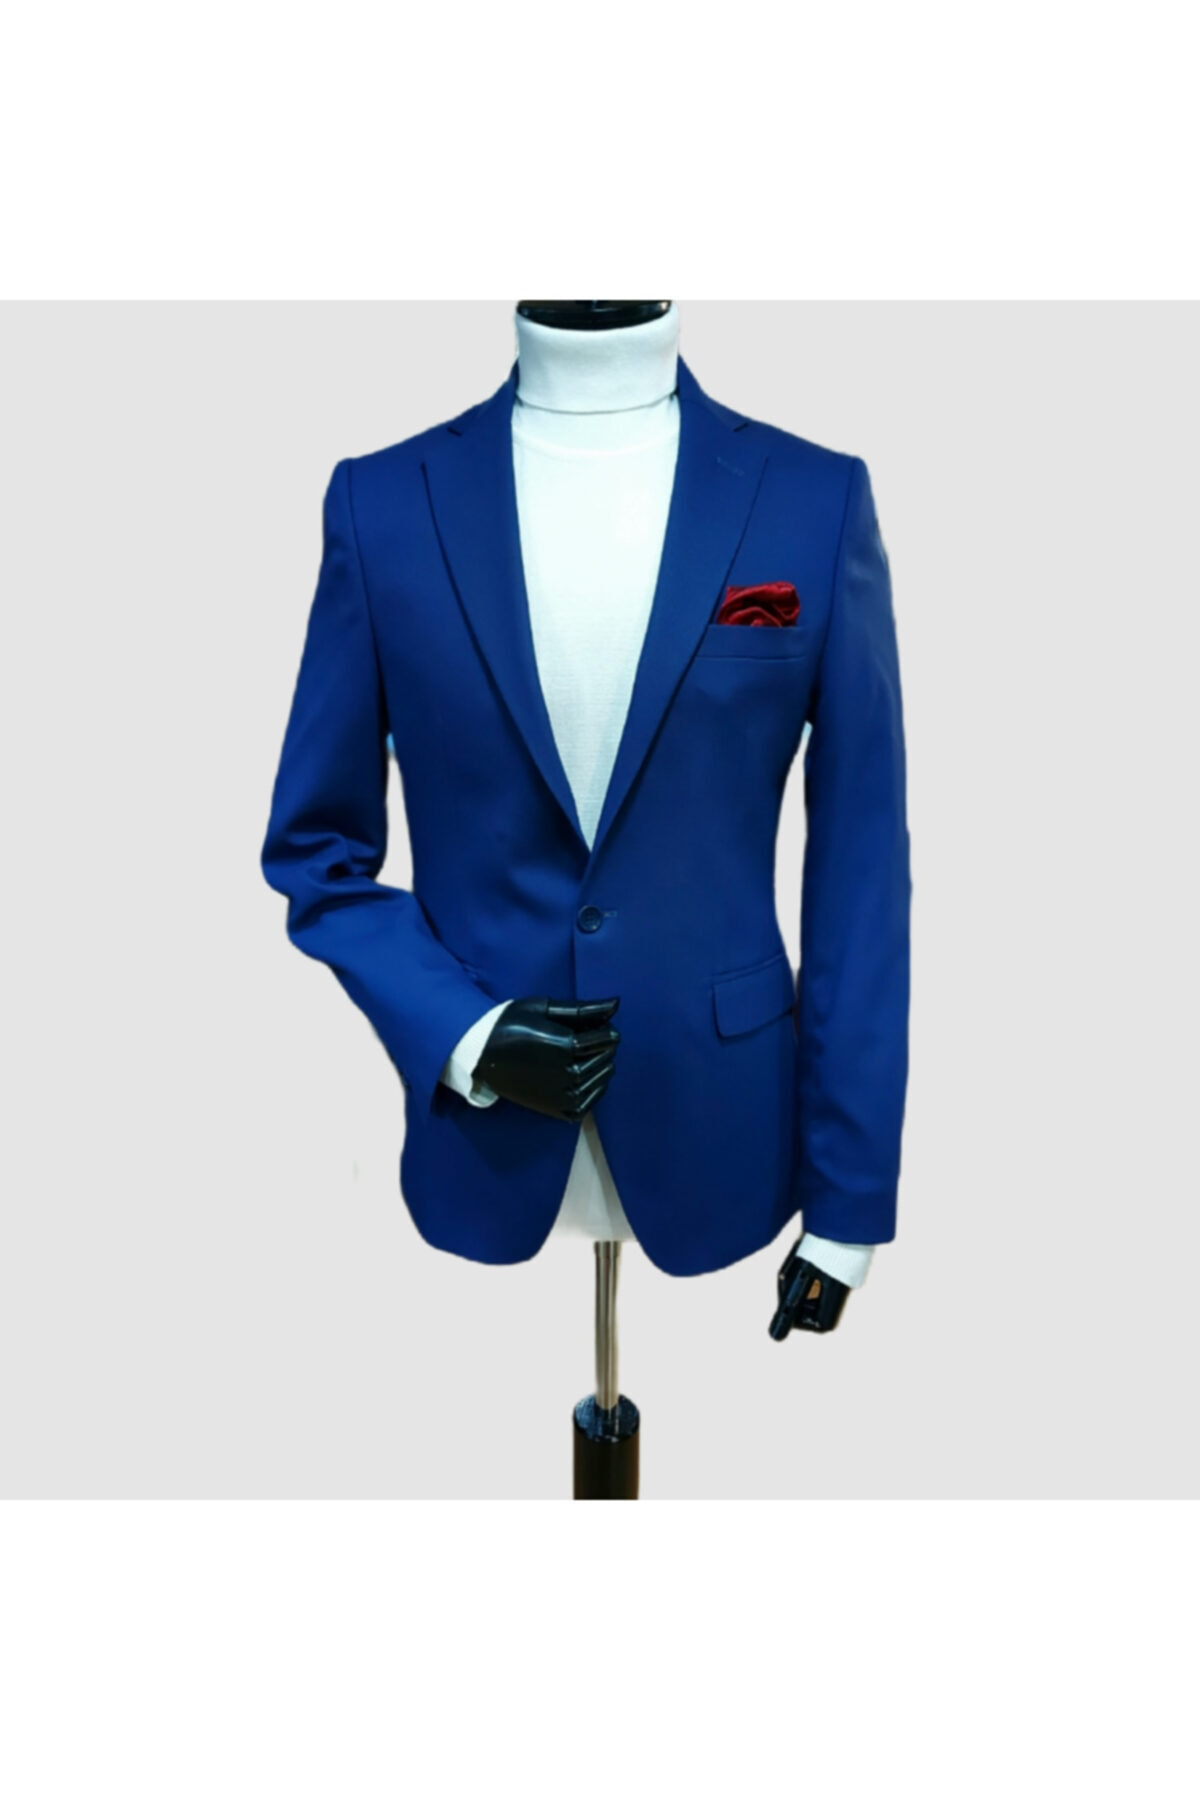 کت تک مردانه ترک برند marka19 رنگ لاجوردی کد ty70648746